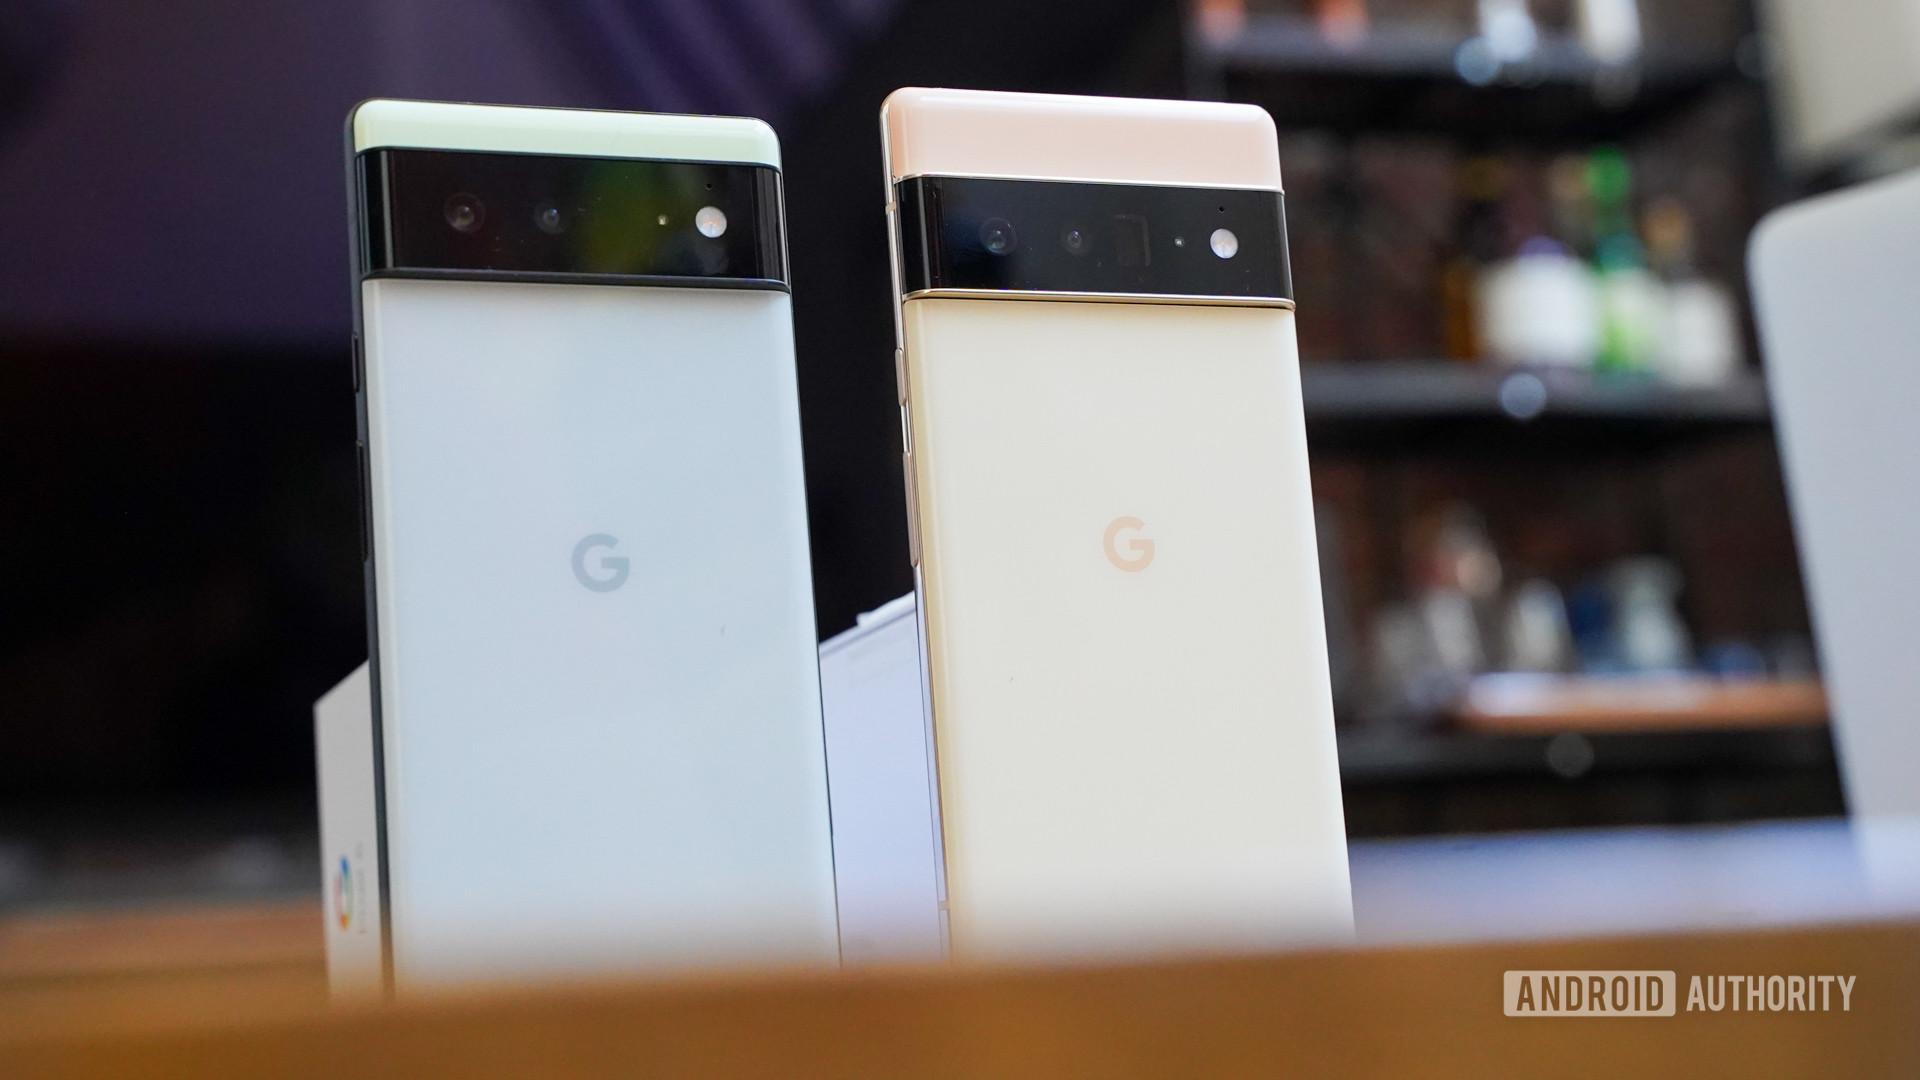 Google Pixel 6 and Pixel 6 Pro left angled rear panels